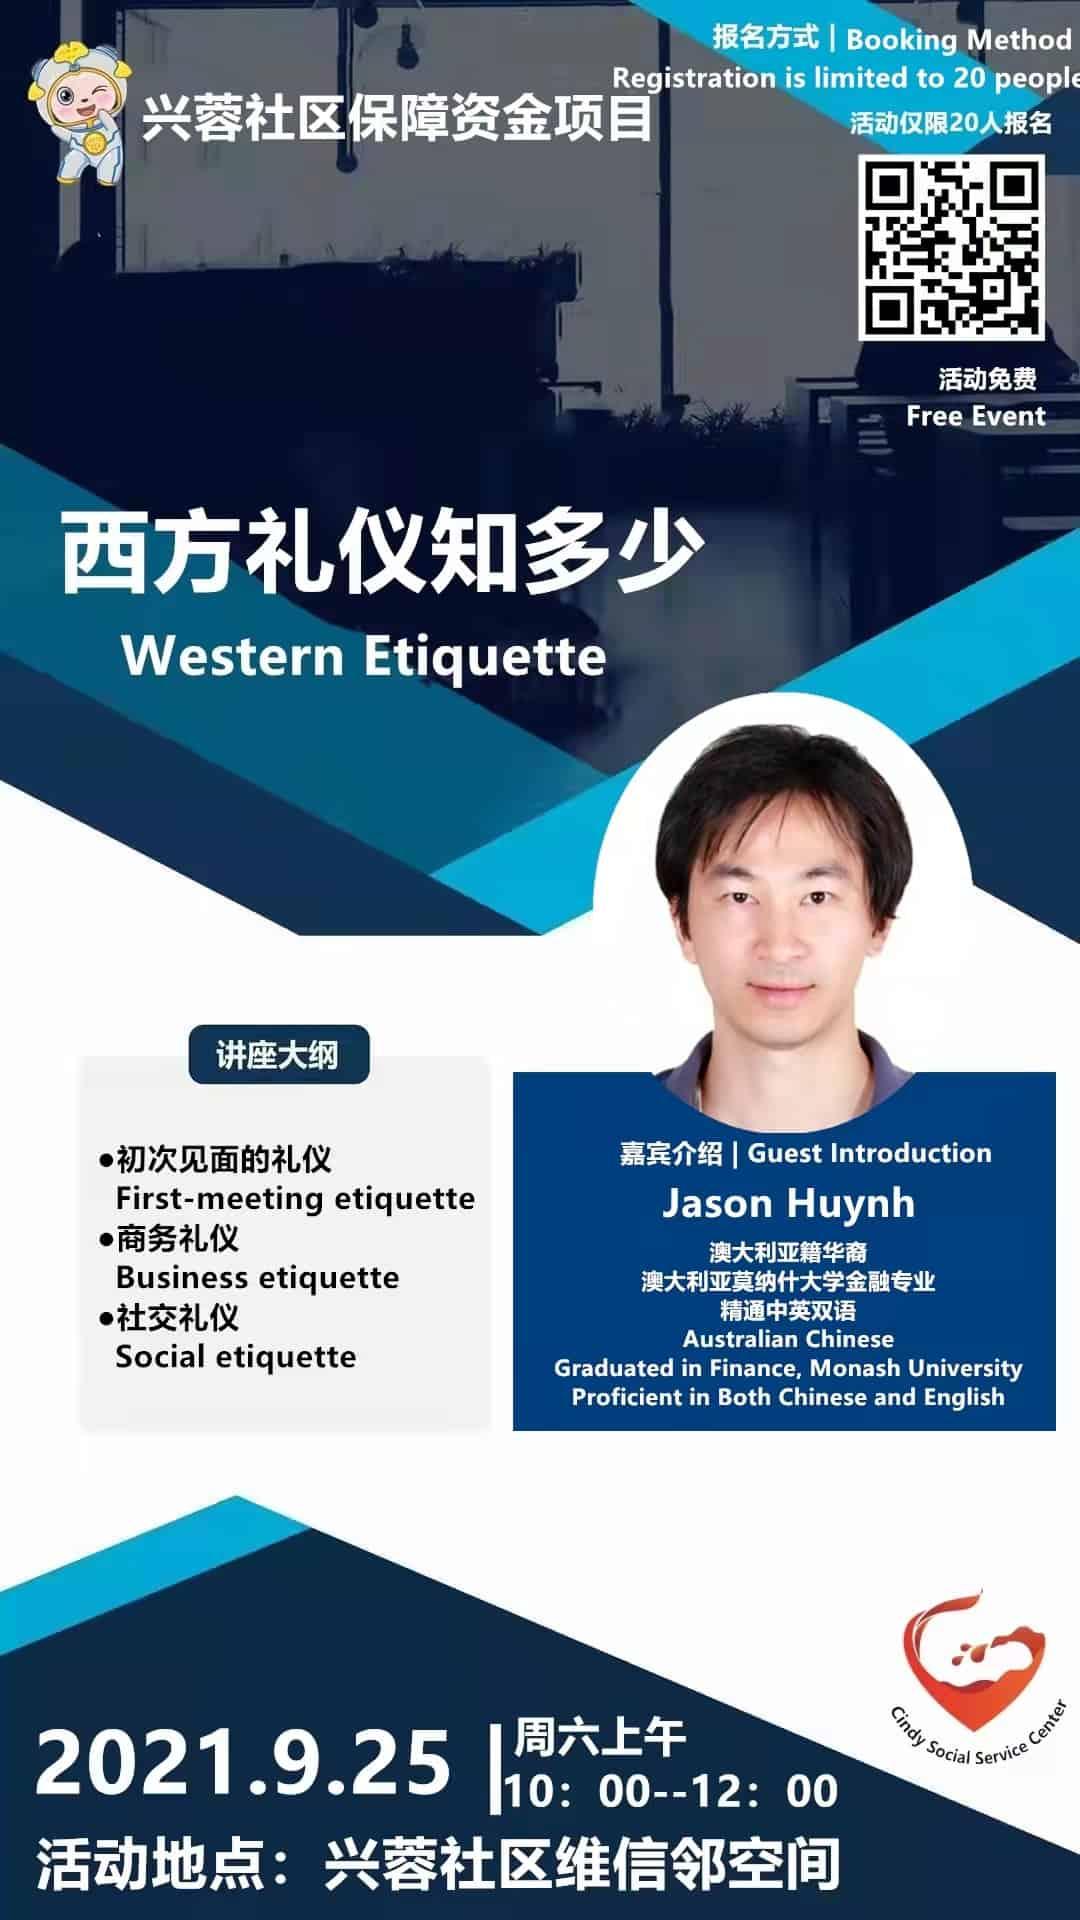 Learn about western etiquette event chengdu expat 1